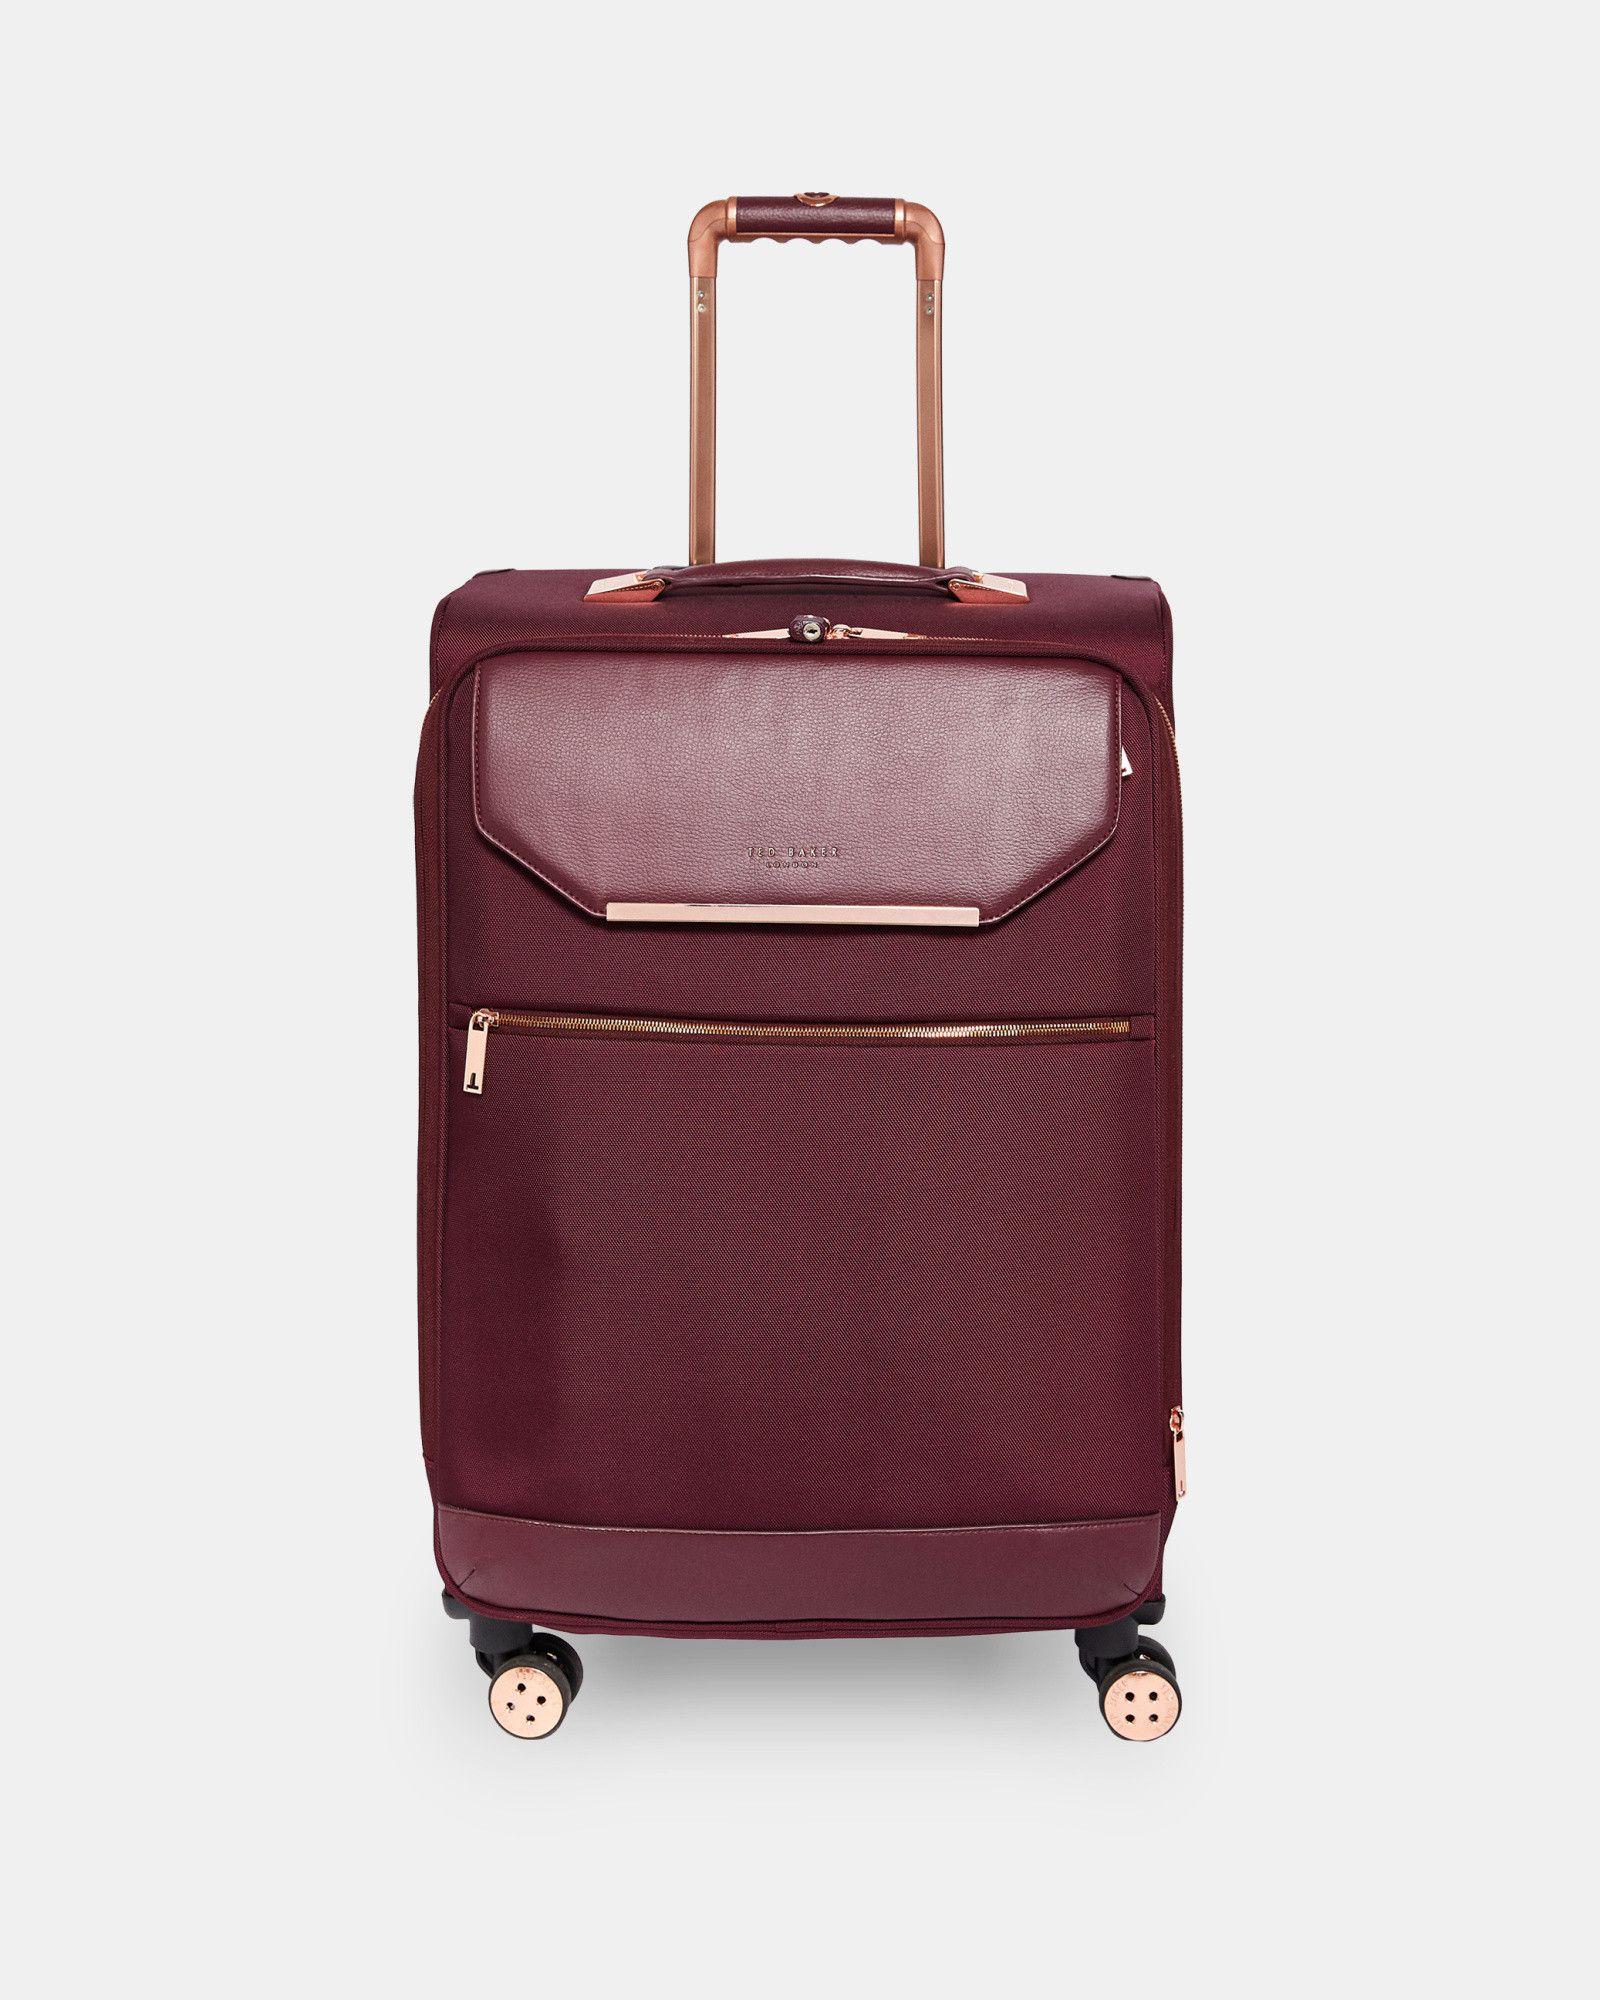 628cb74a3 LUGGOL Metallic trim medium suitcase  TedToToe